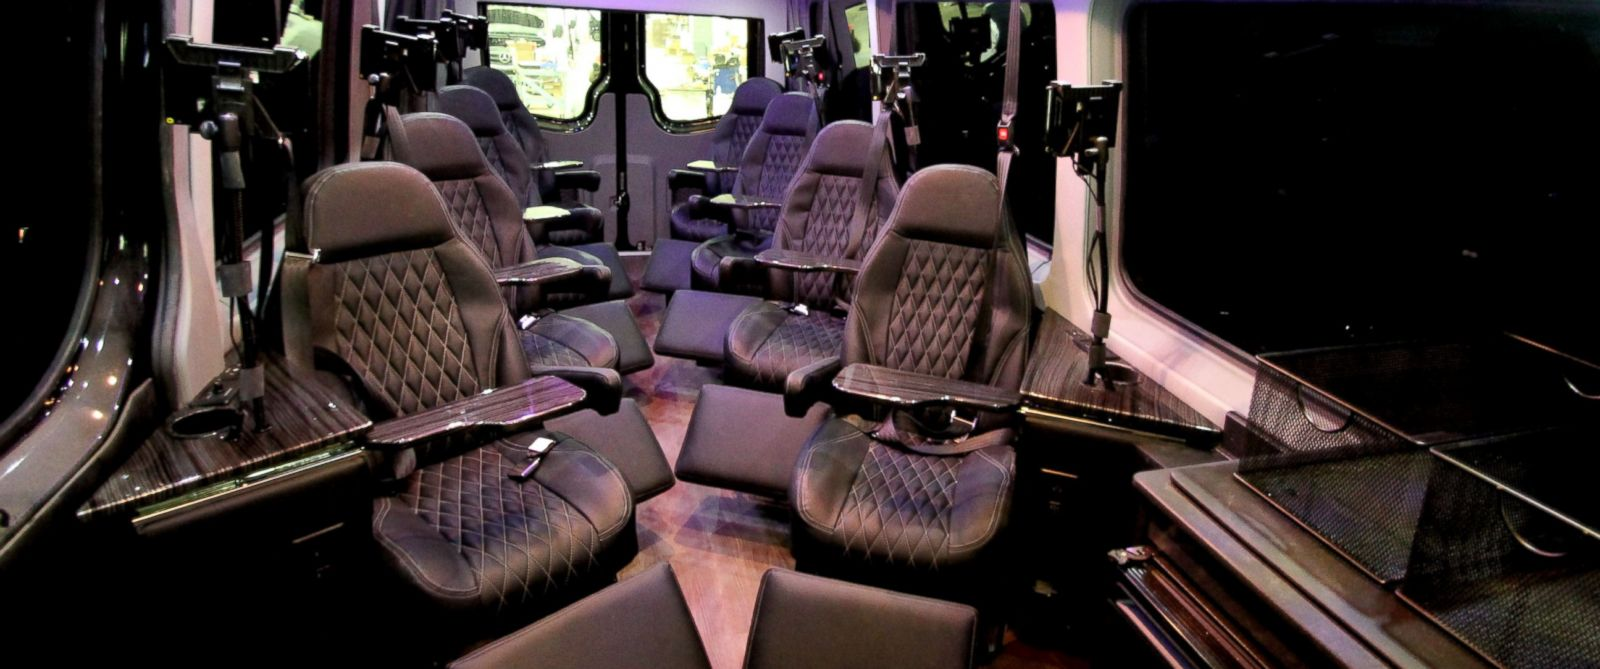 PHOTO: Royal Sprinter offers luxury van transportation between New York and Washington, D.C.